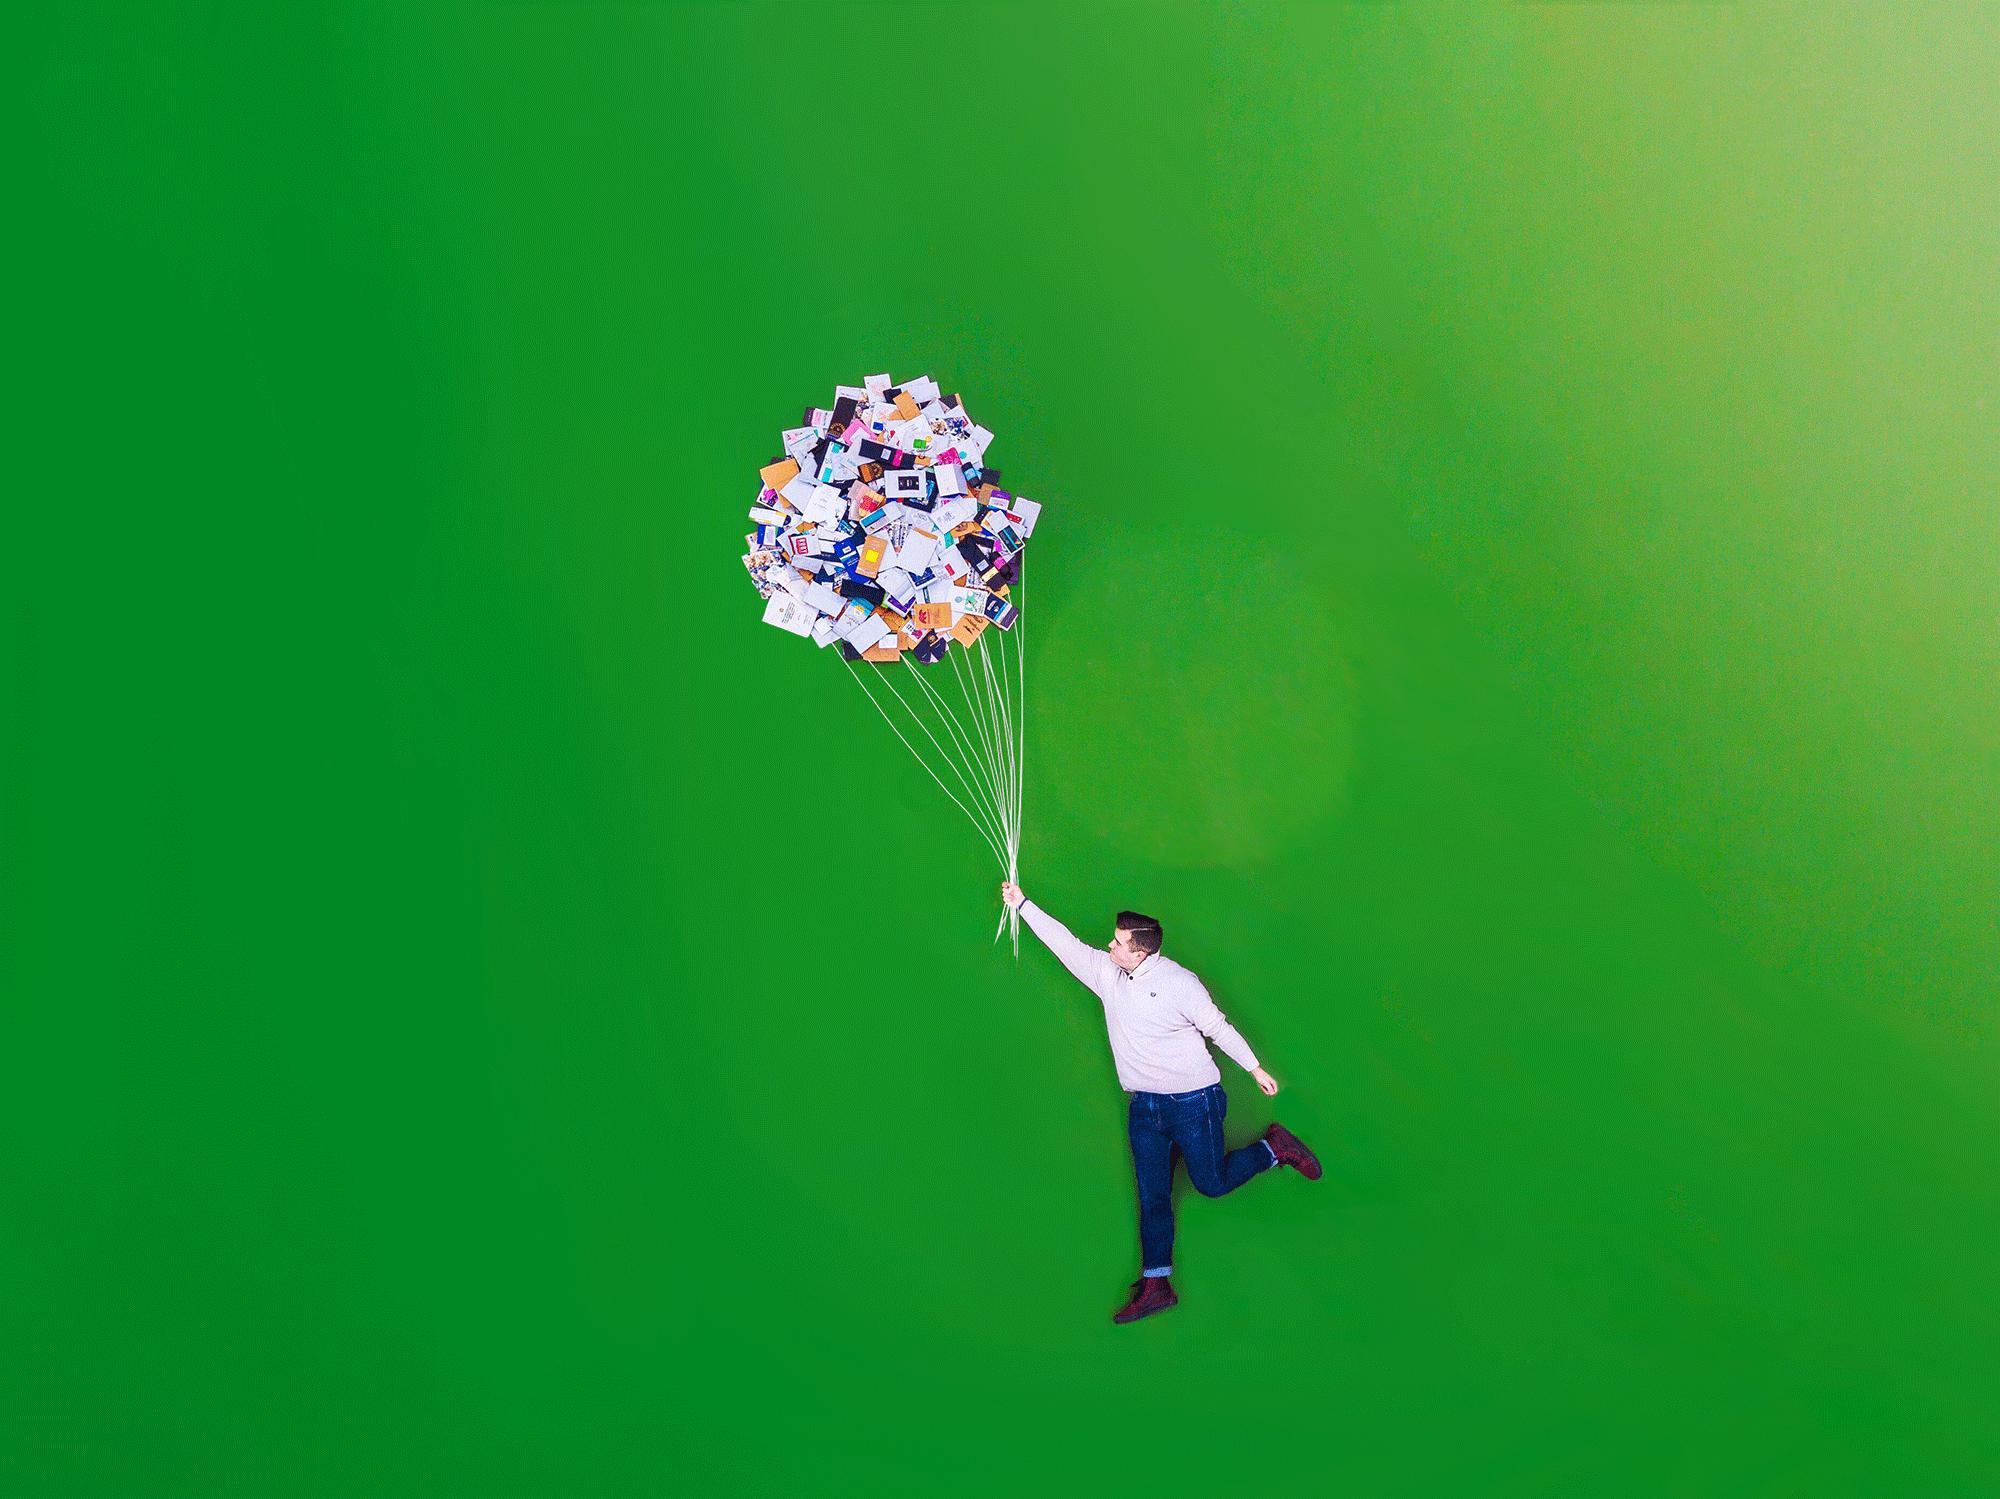 Bag-Balloons2.png